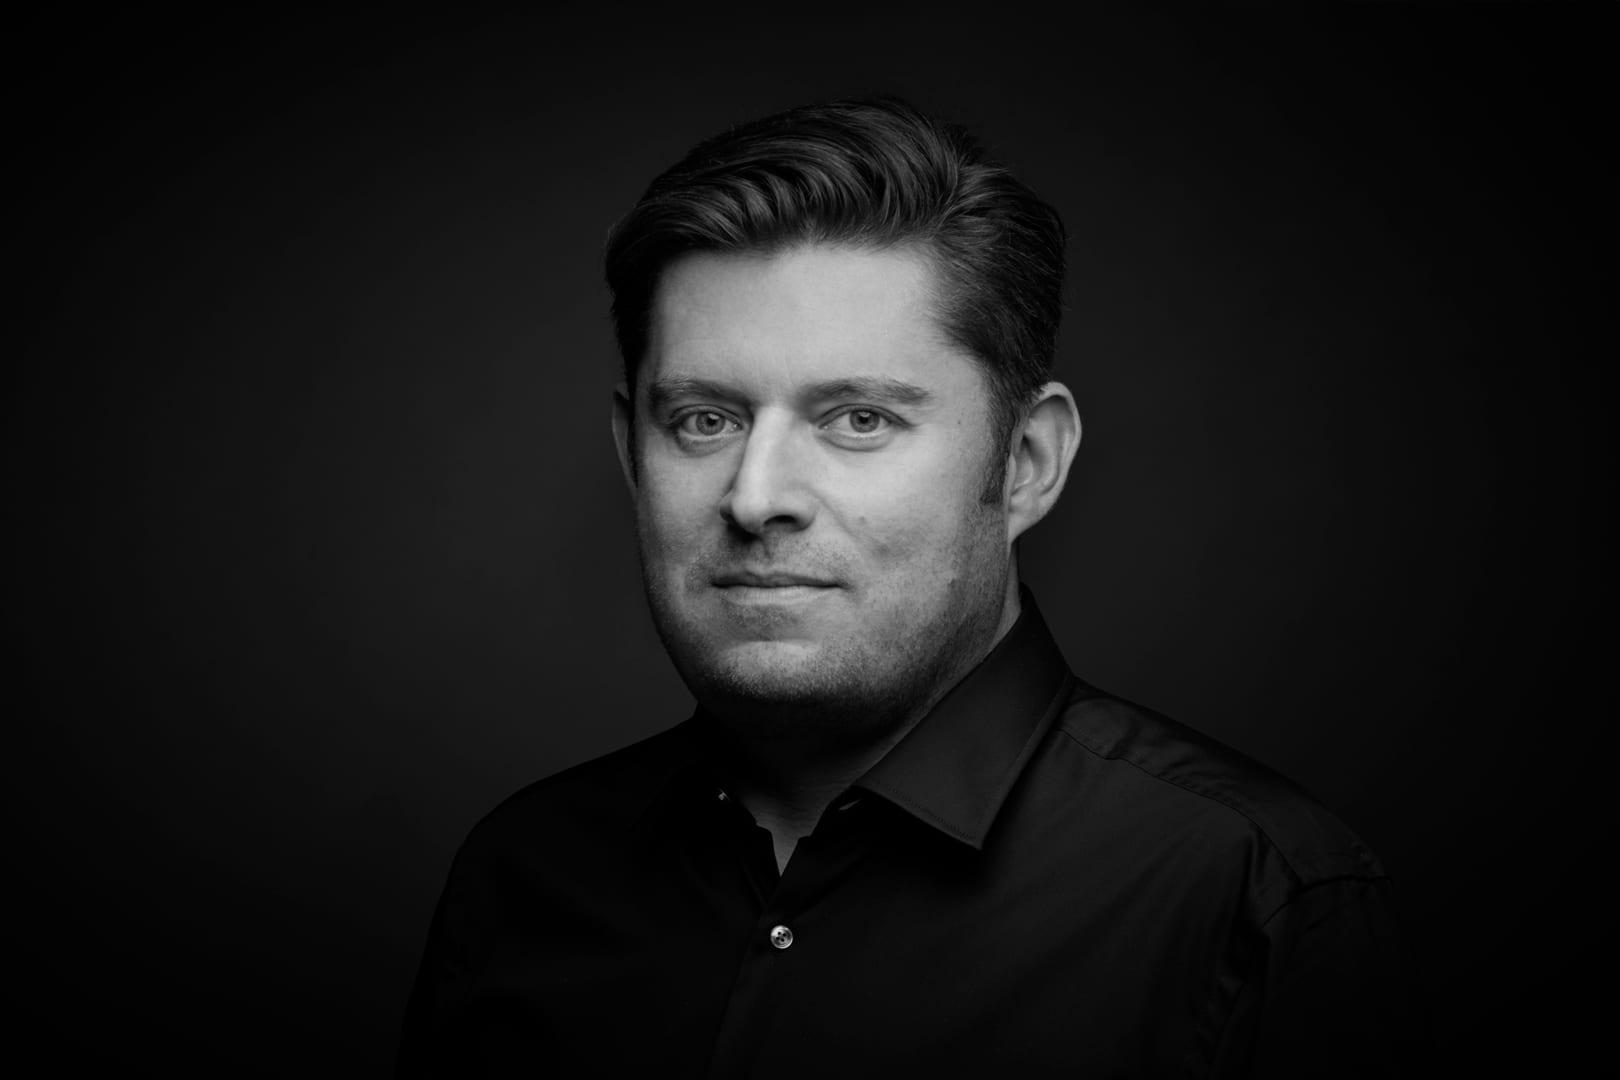 Gunnar_Menzel_Portraitfotograf_41